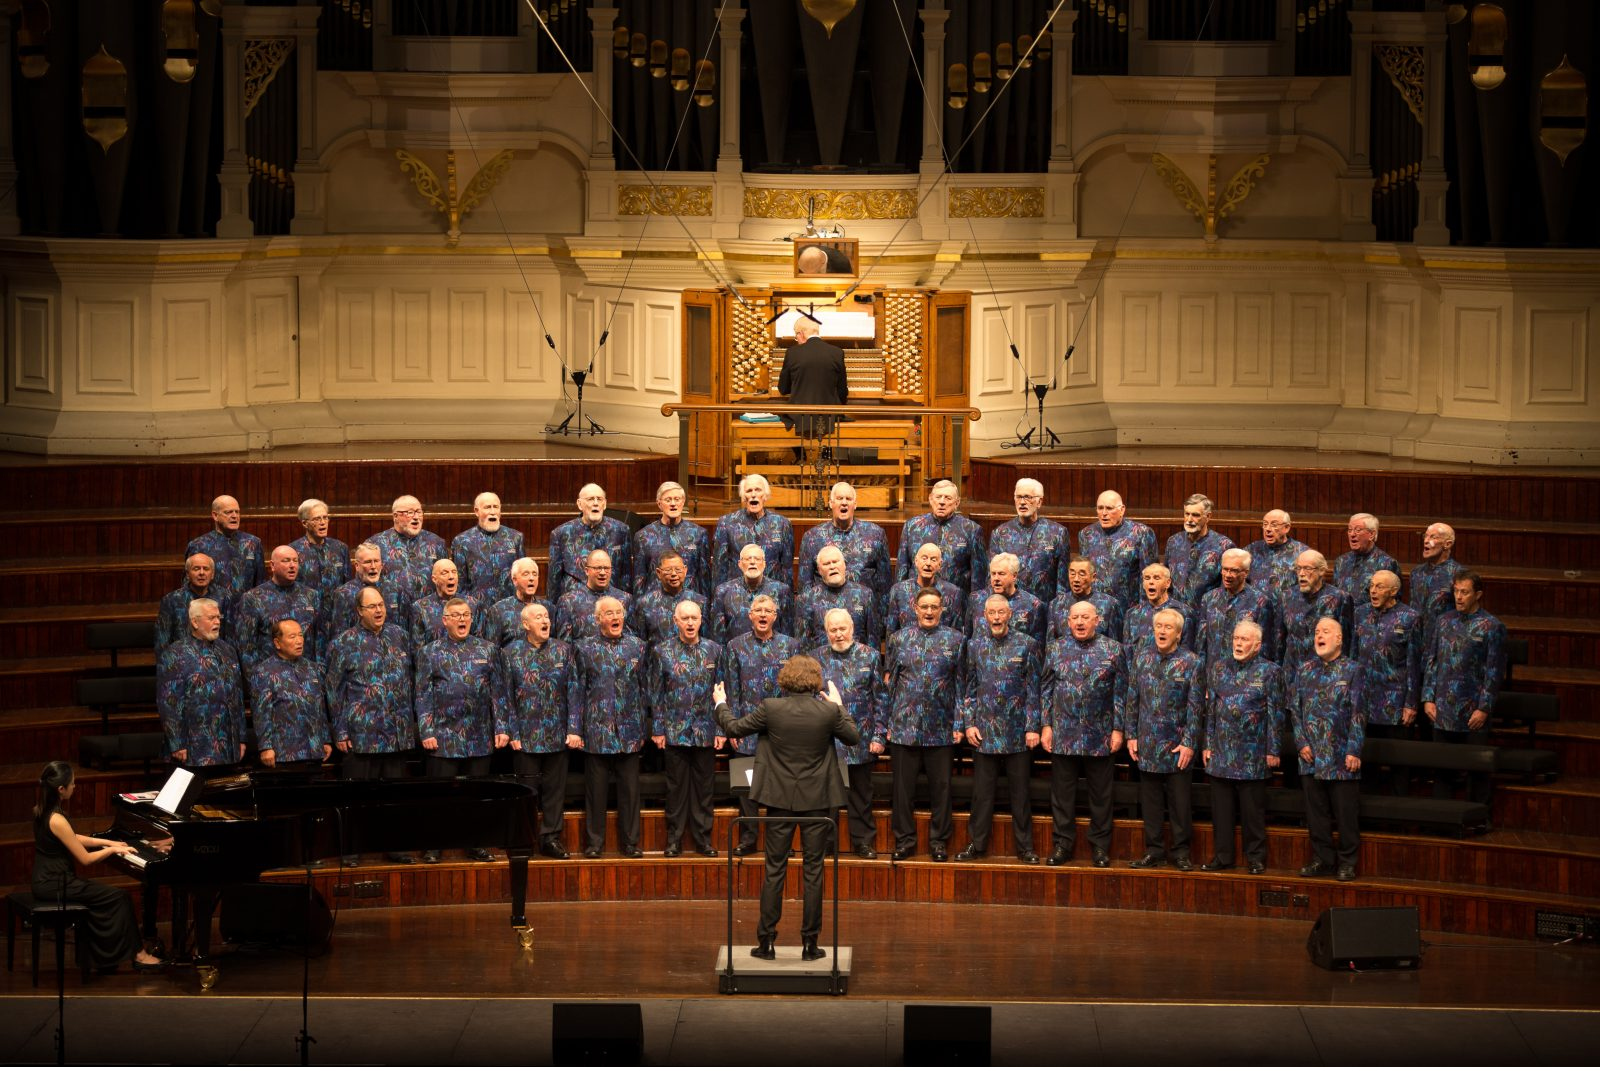 Sydney Male Choir, Music Director and Accompanist